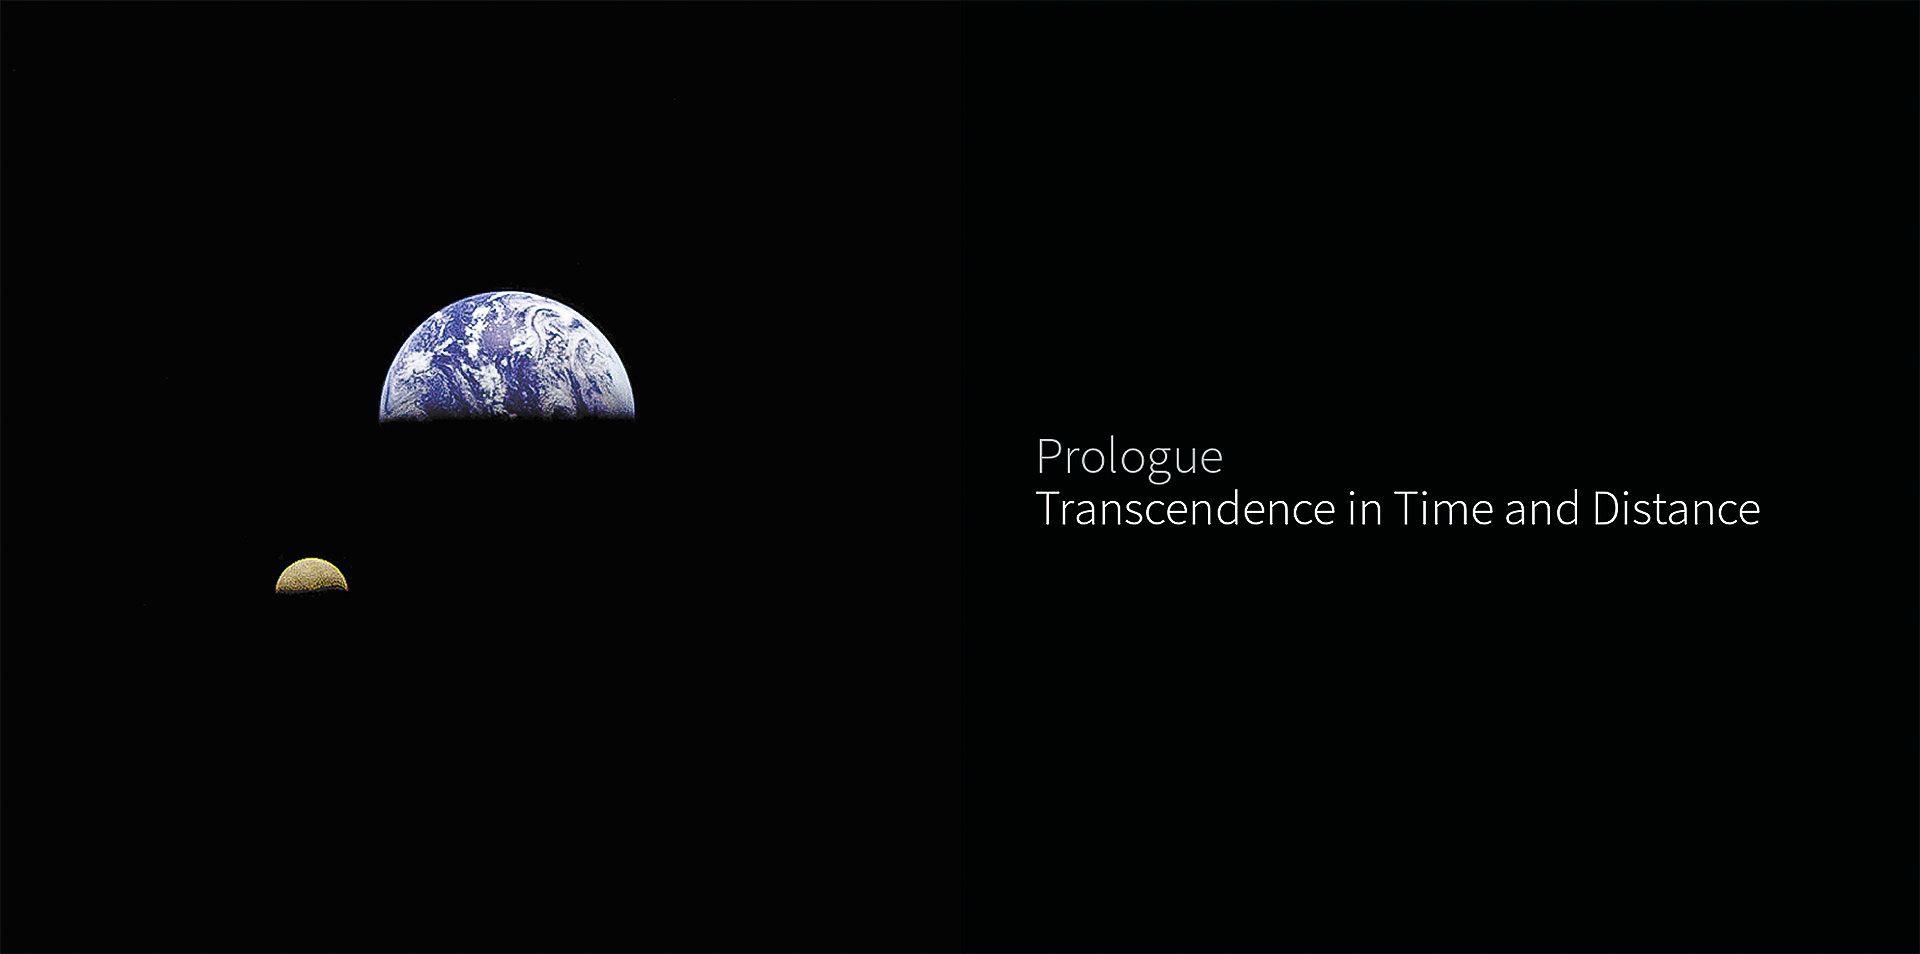 IW Prologue.jpg